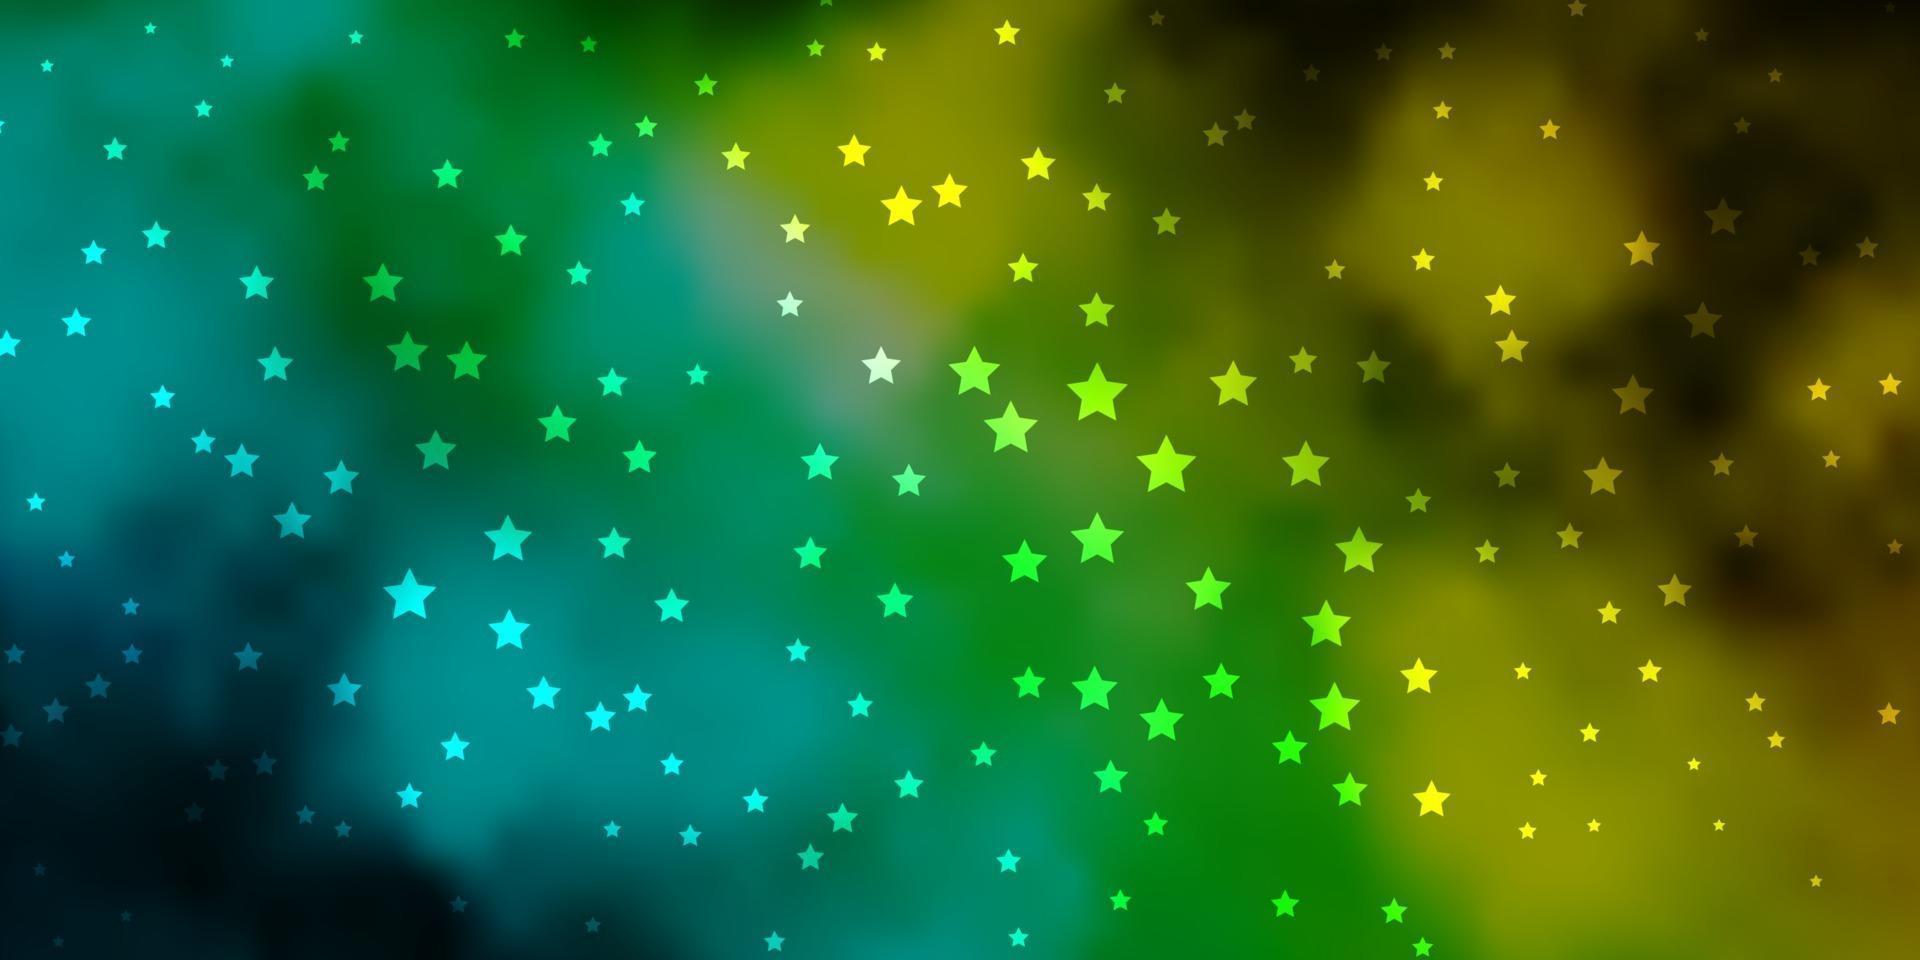 Fondo de vector azul oscuro, verde con estrellas de colores.